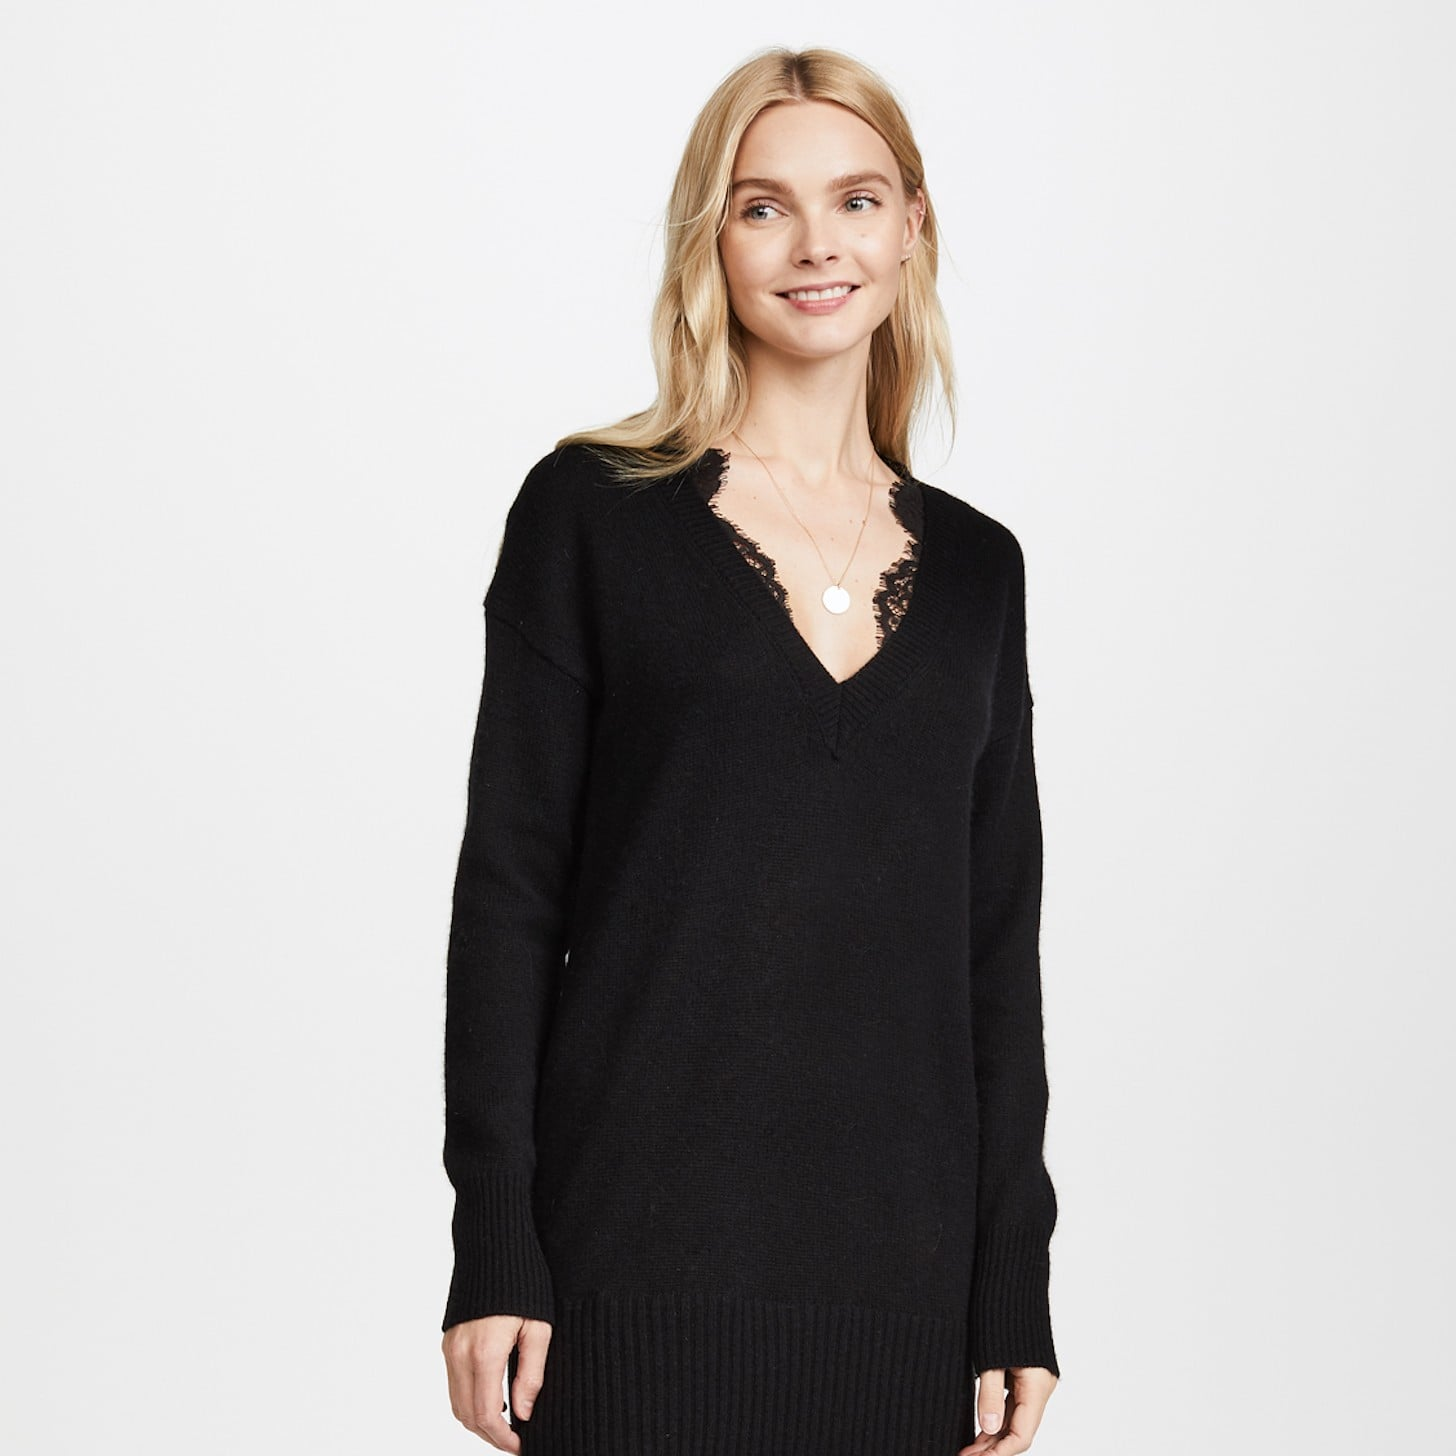 bc46546e58c Best Sweater Dresses